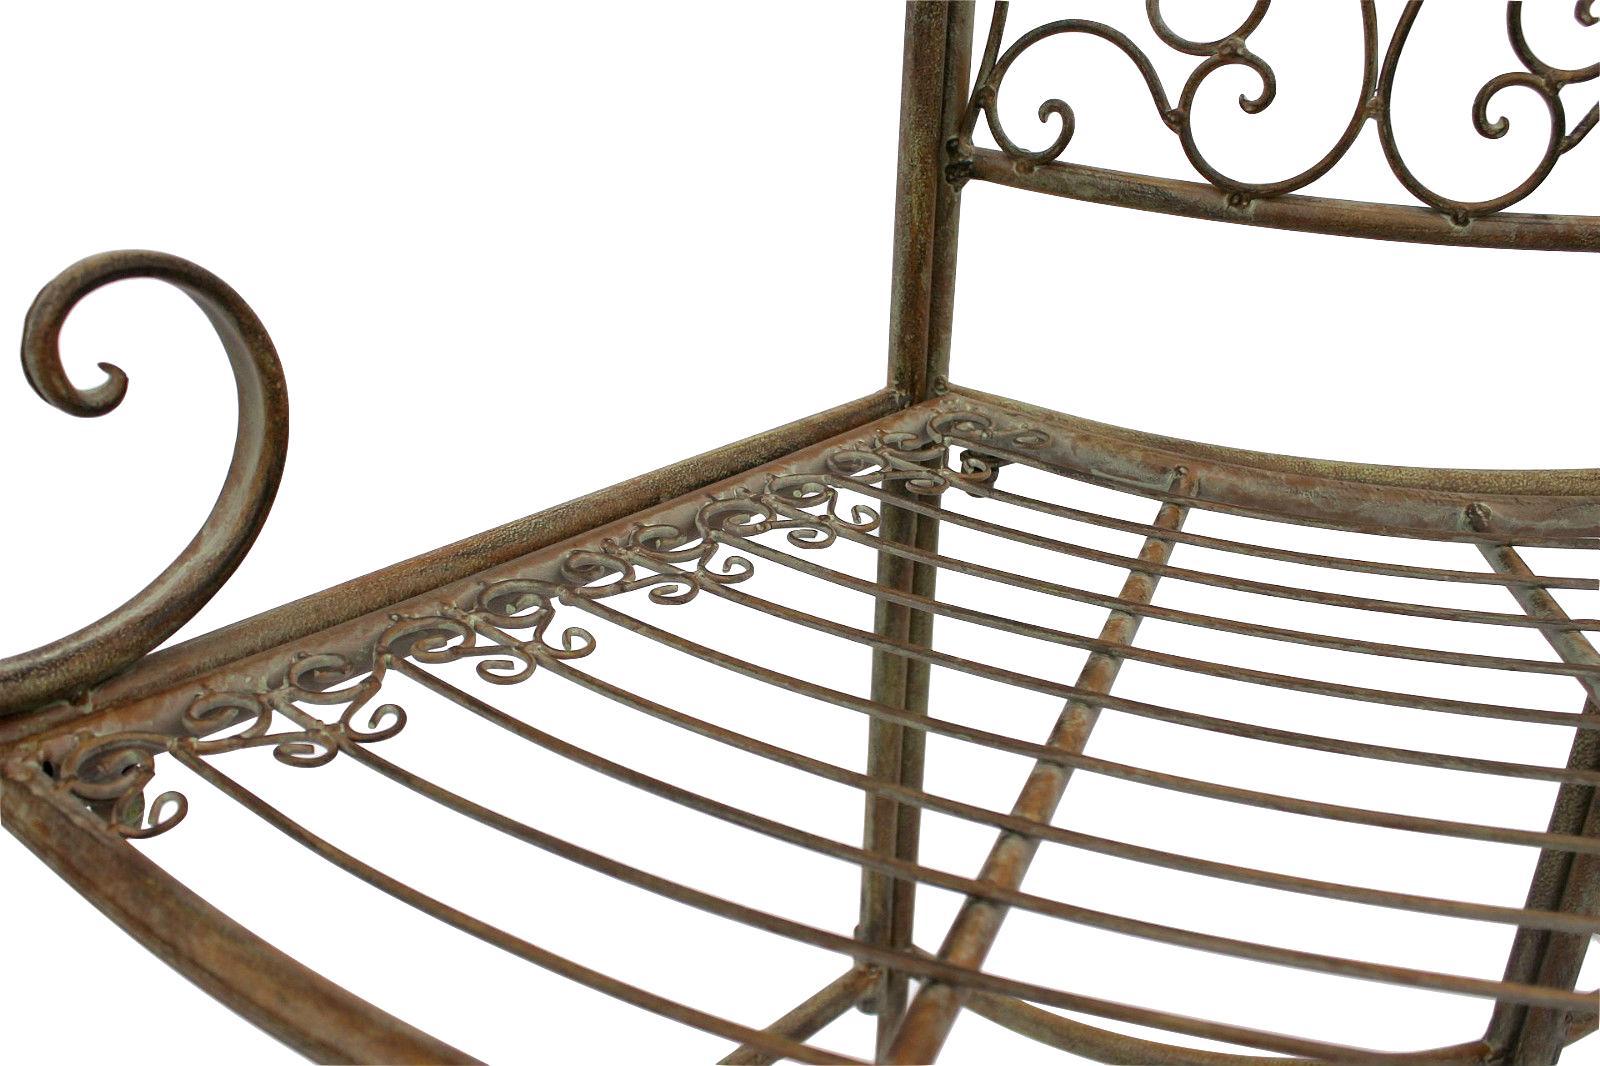 bank jc112287 aus metall gartenbank sitzbank baumbank 2 sitzer 135 cm rundbank 4019111122873 ebay. Black Bedroom Furniture Sets. Home Design Ideas